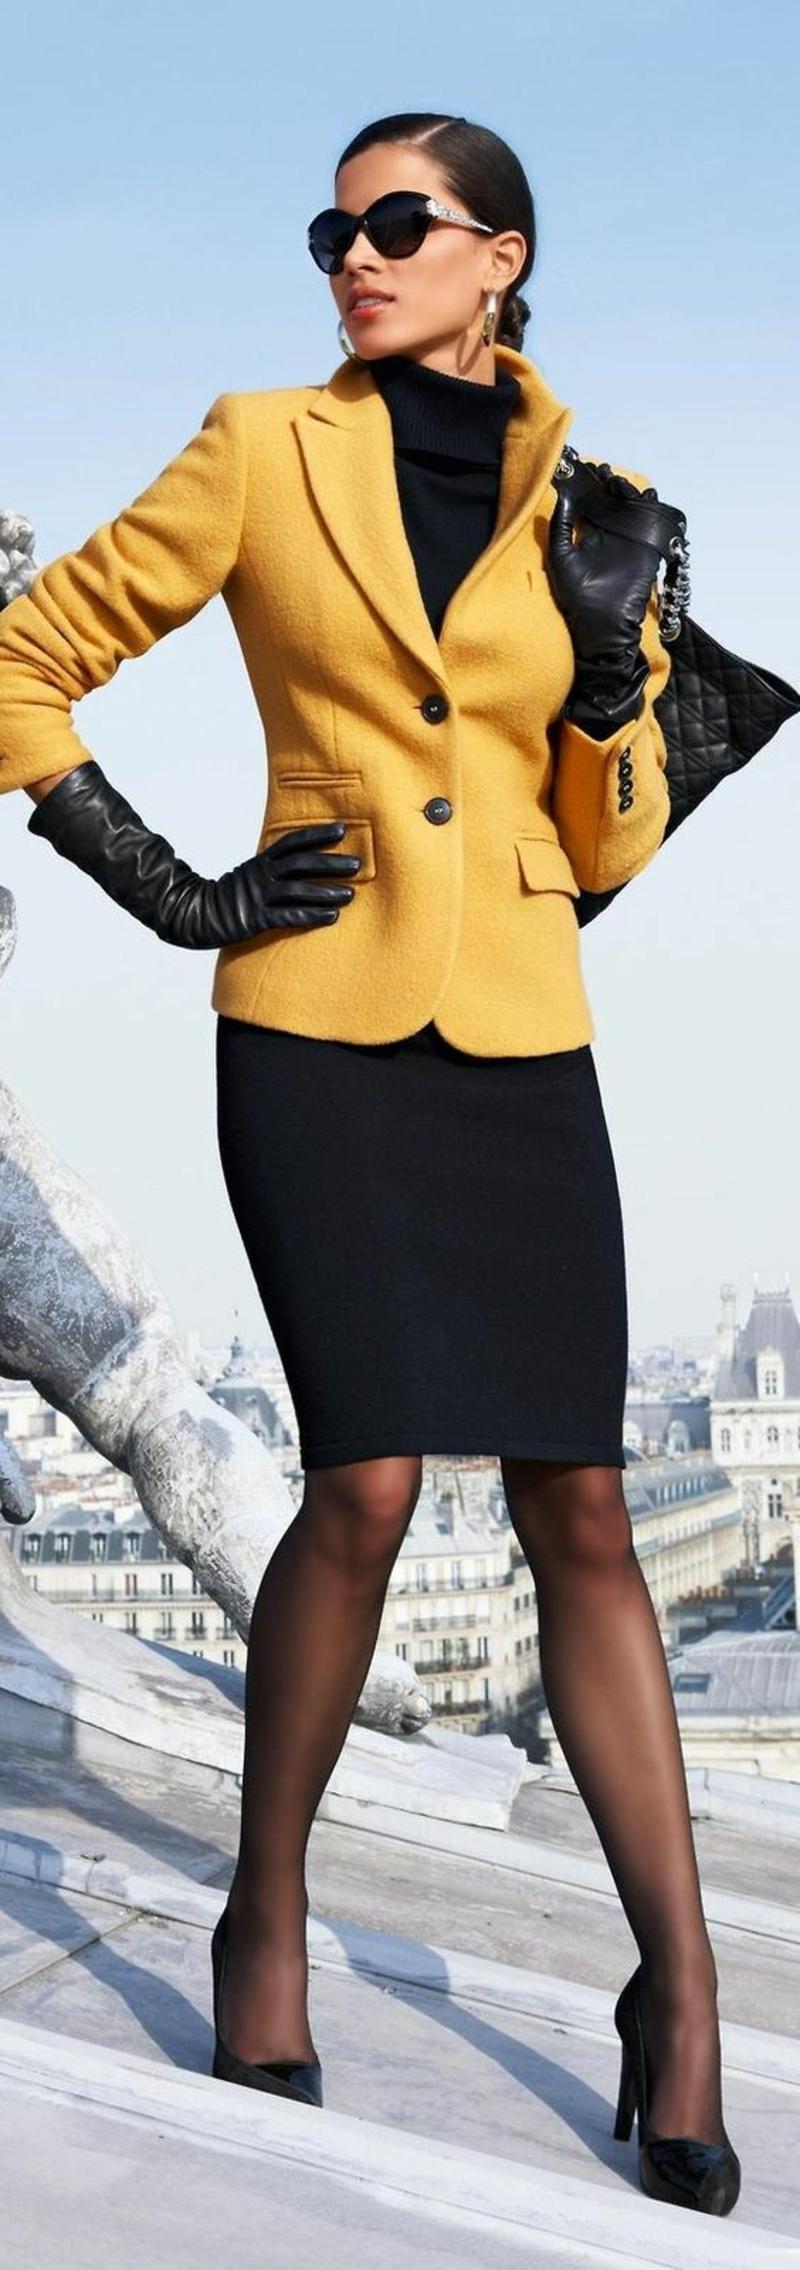 Bussinessmode Damen Sakko gelb Damenmode Bleistiftsrock